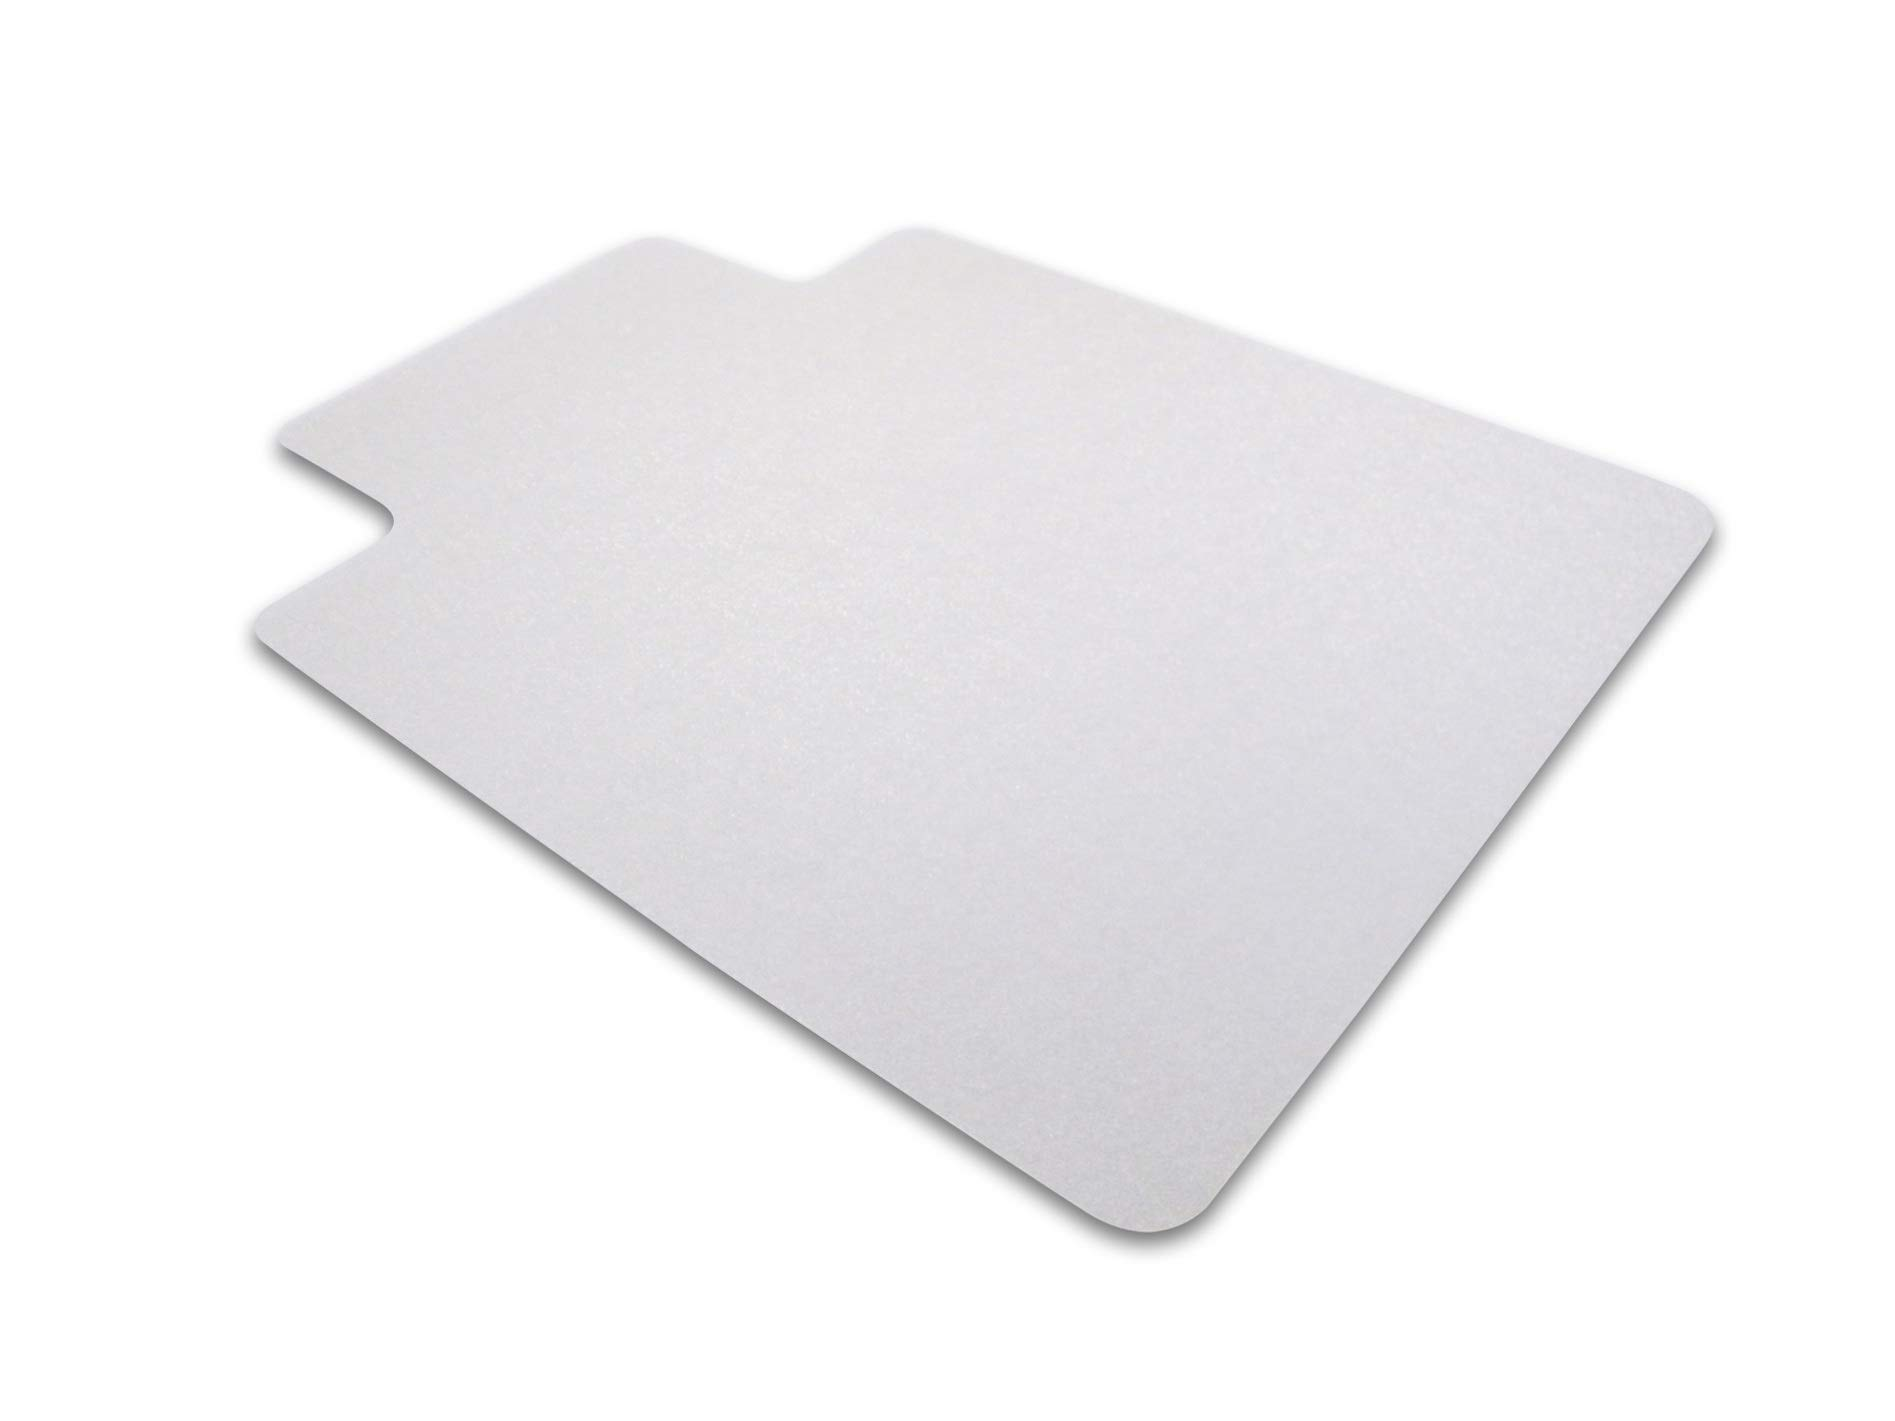 Cleartex UnoMat, Anti-Slip Chair Mat, for Polished Hard Floors/Carpet Tiles, Rectangular with Lip, 48'' x 60'' (FR1215020LRA)